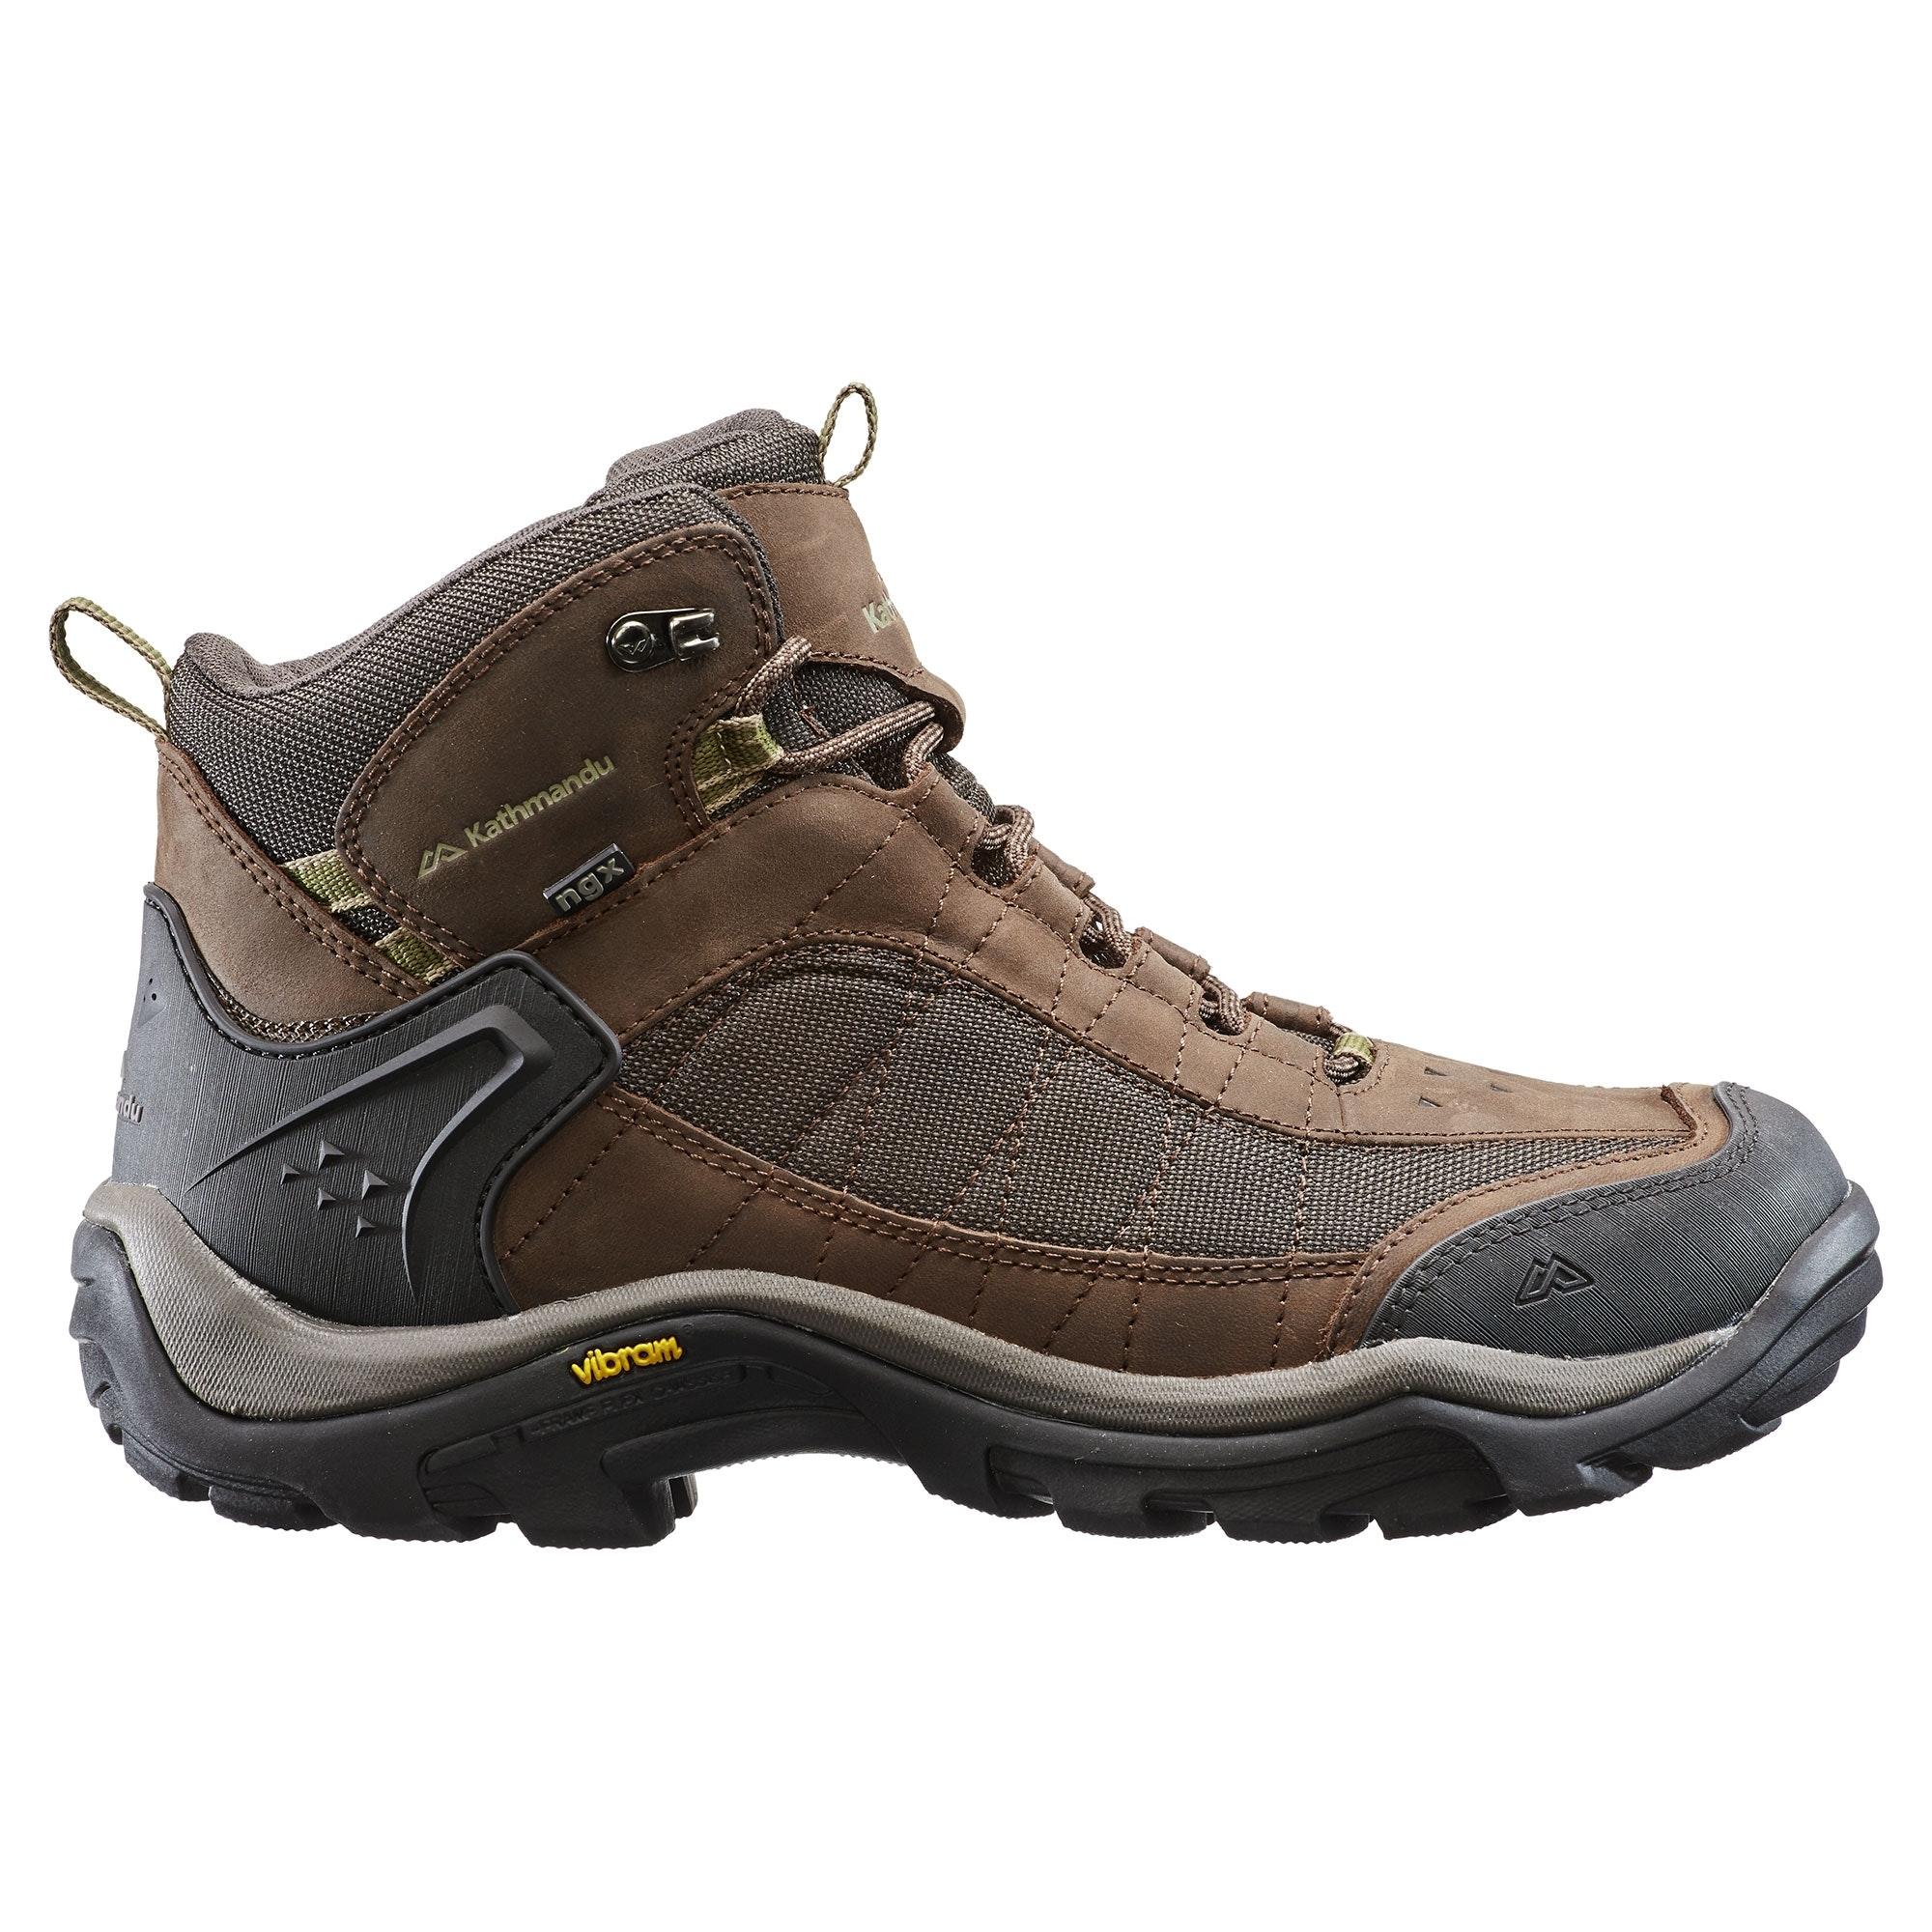 NEW-Kathmandu-Mornington-Mens-Vibram-Rubber-Waterproof-Lightweight-Hiking-Boots thumbnail 5